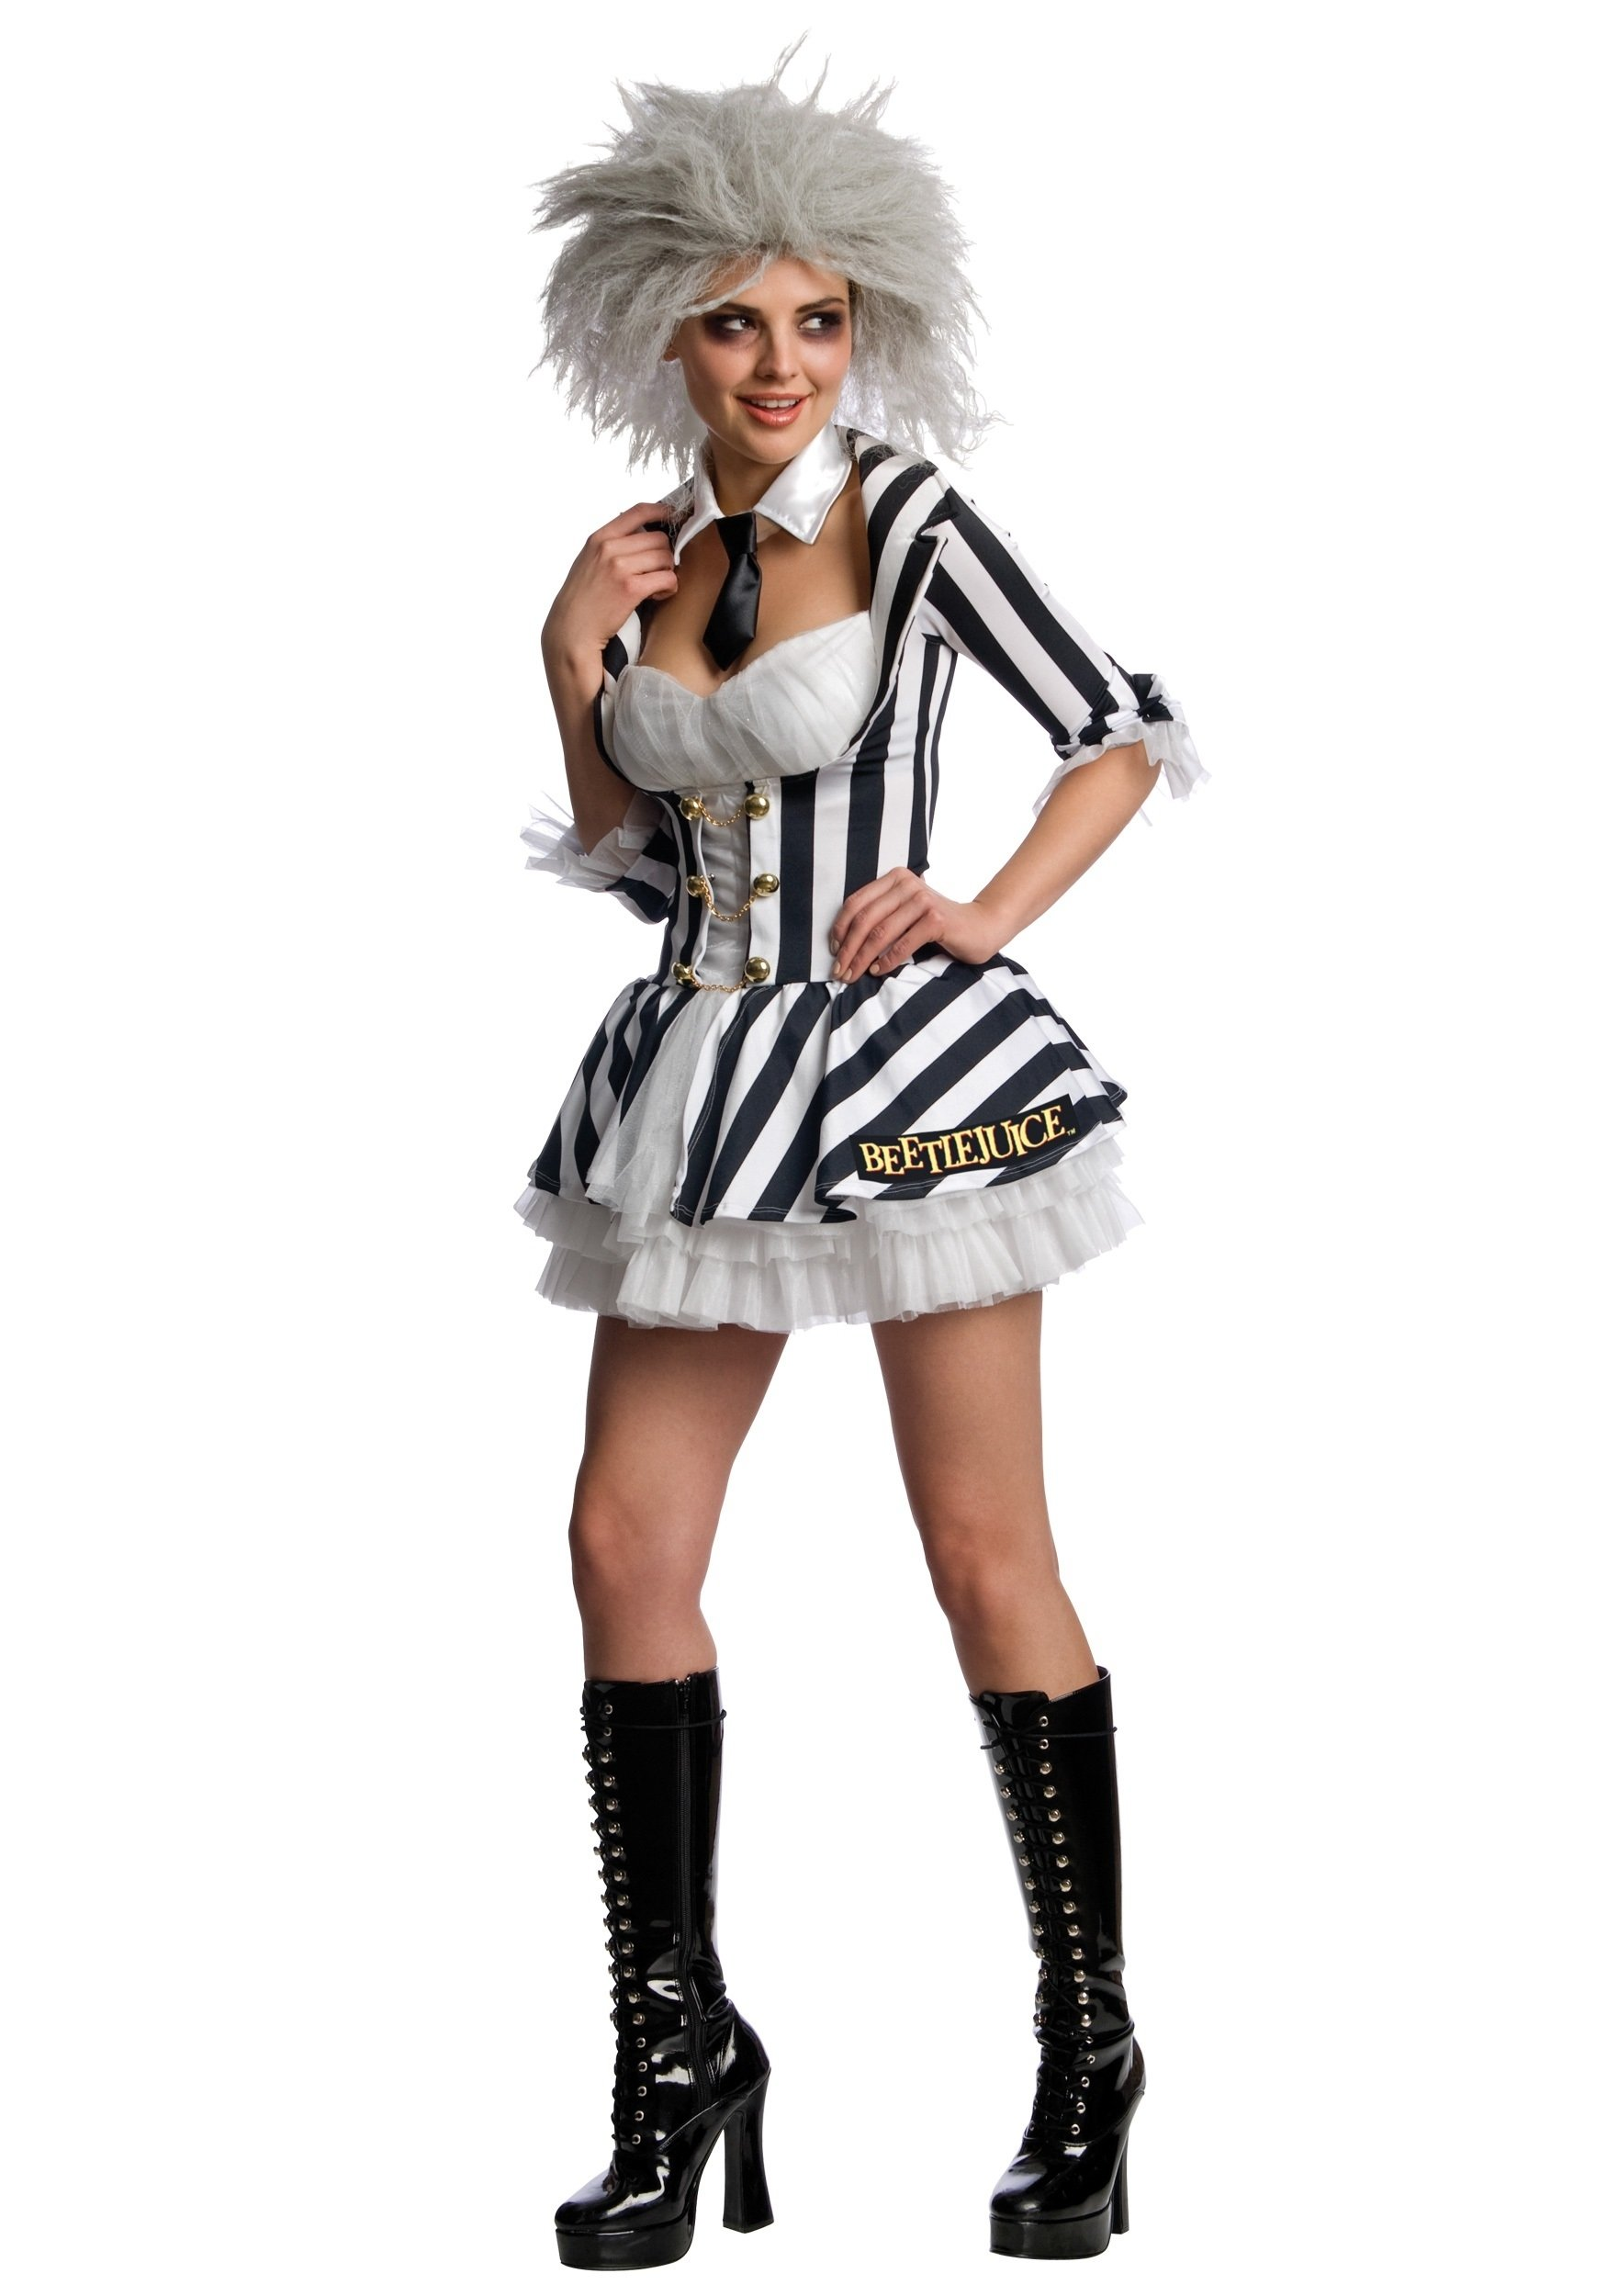 10 Stylish Movie Costume Ideas For Women sexy ms beetlejuice costume womens sexy scary movie costume ideas 2021